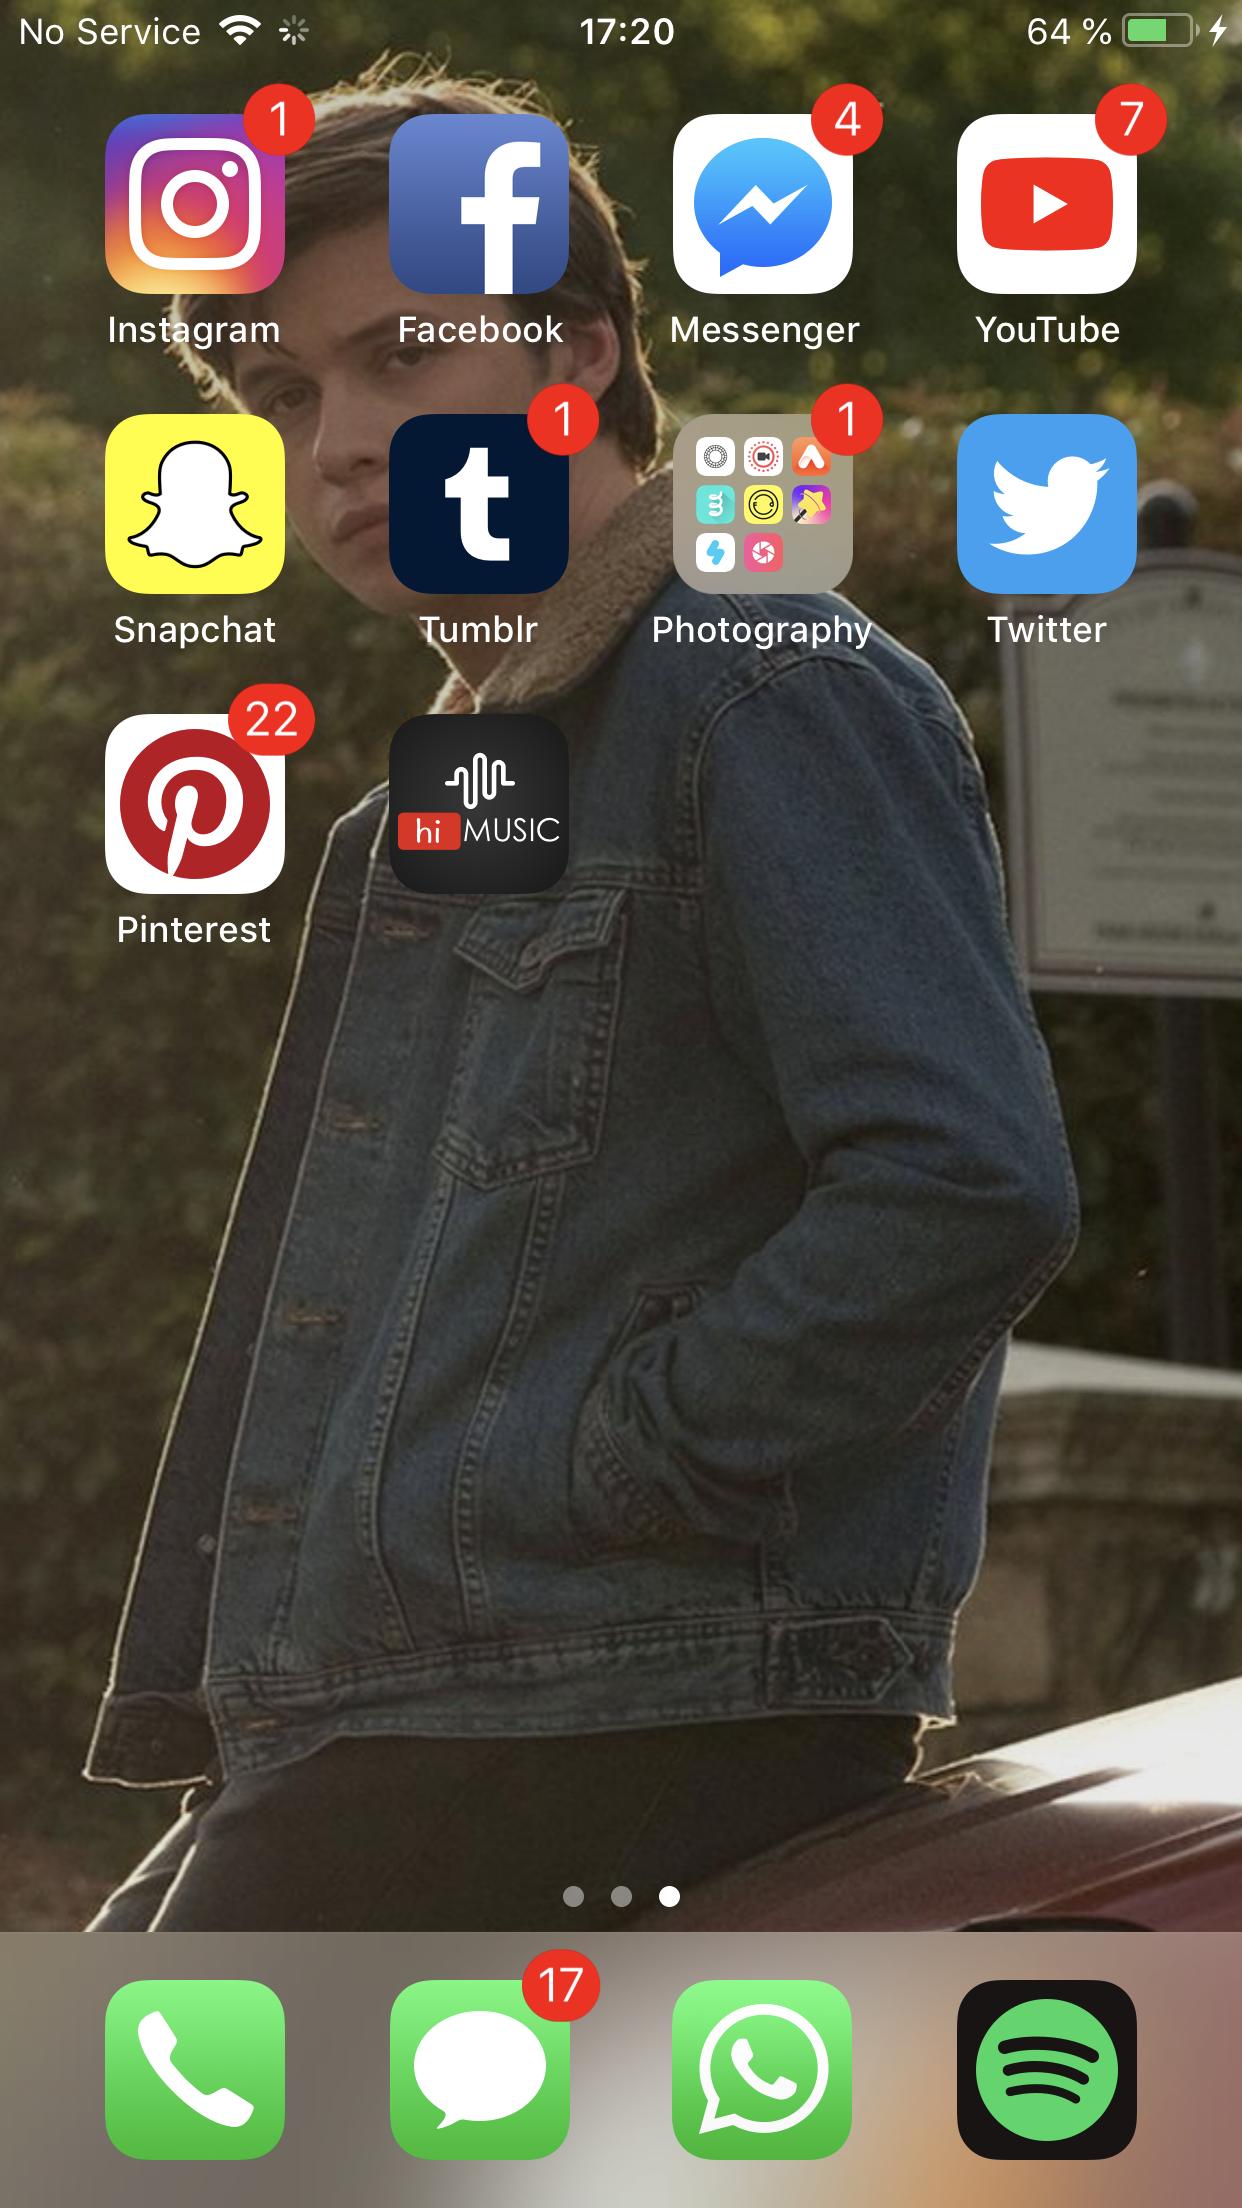 App St Iphone Screensh Bts — Browardcountymedicalassociation